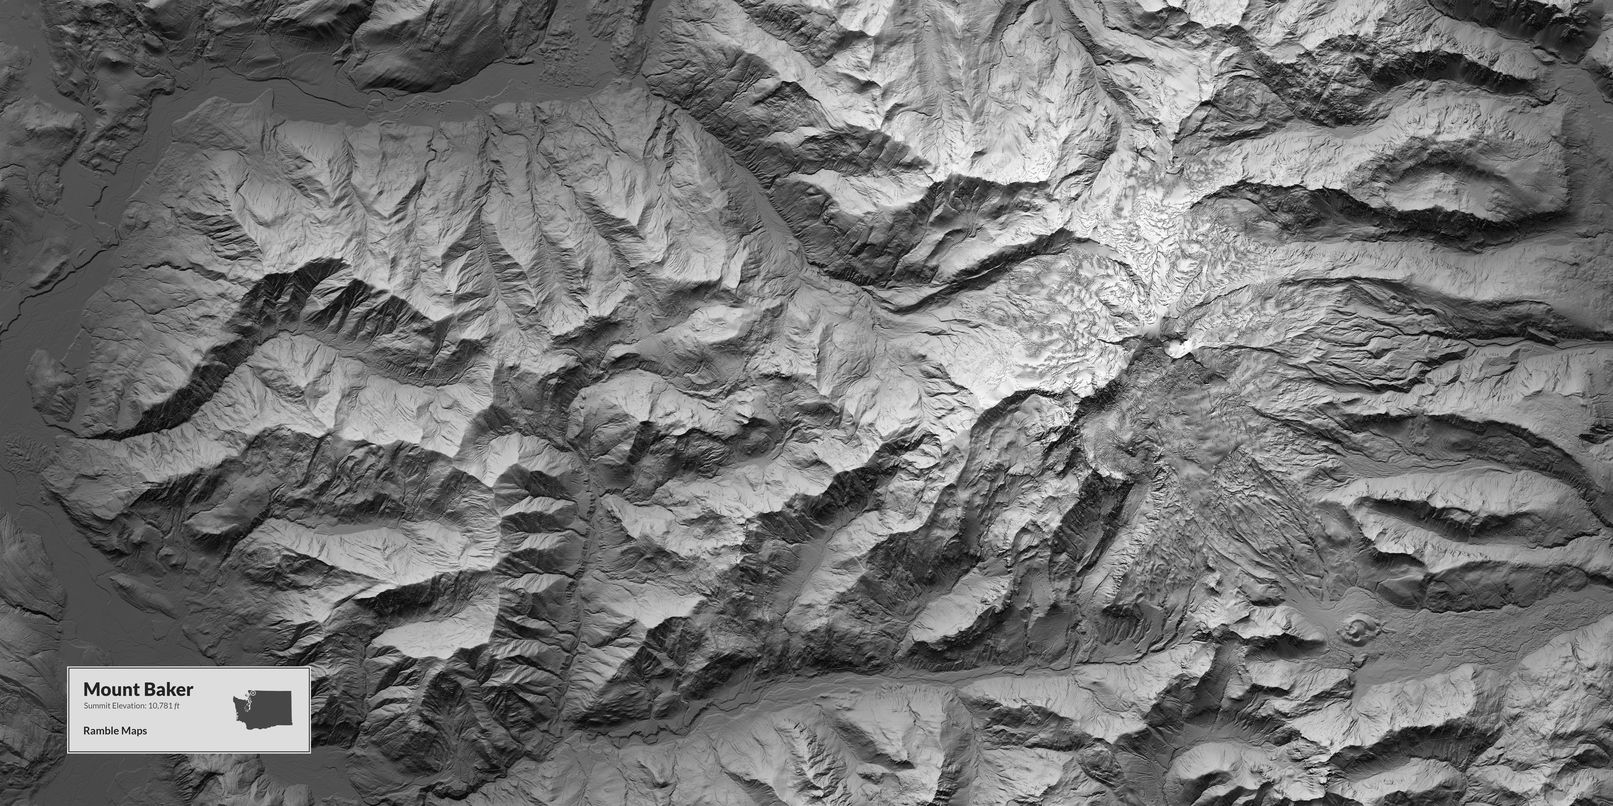 Map of Mount Baker